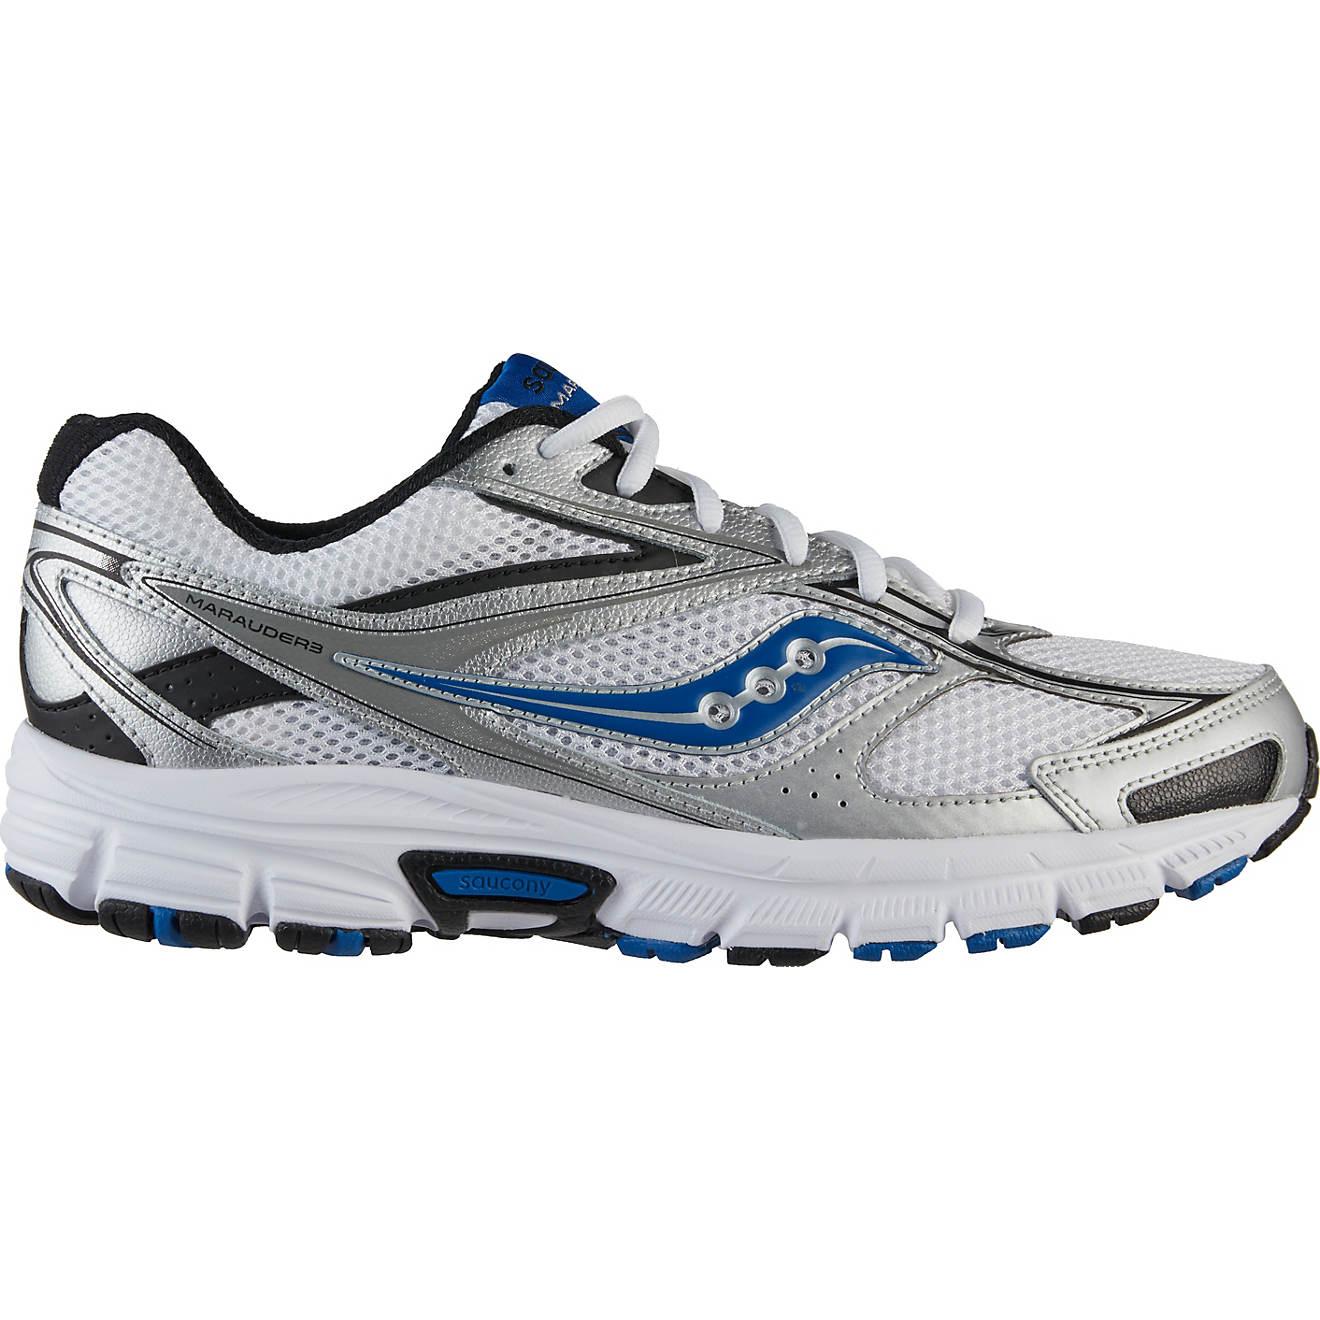 Grid Marauder 3 running shoes